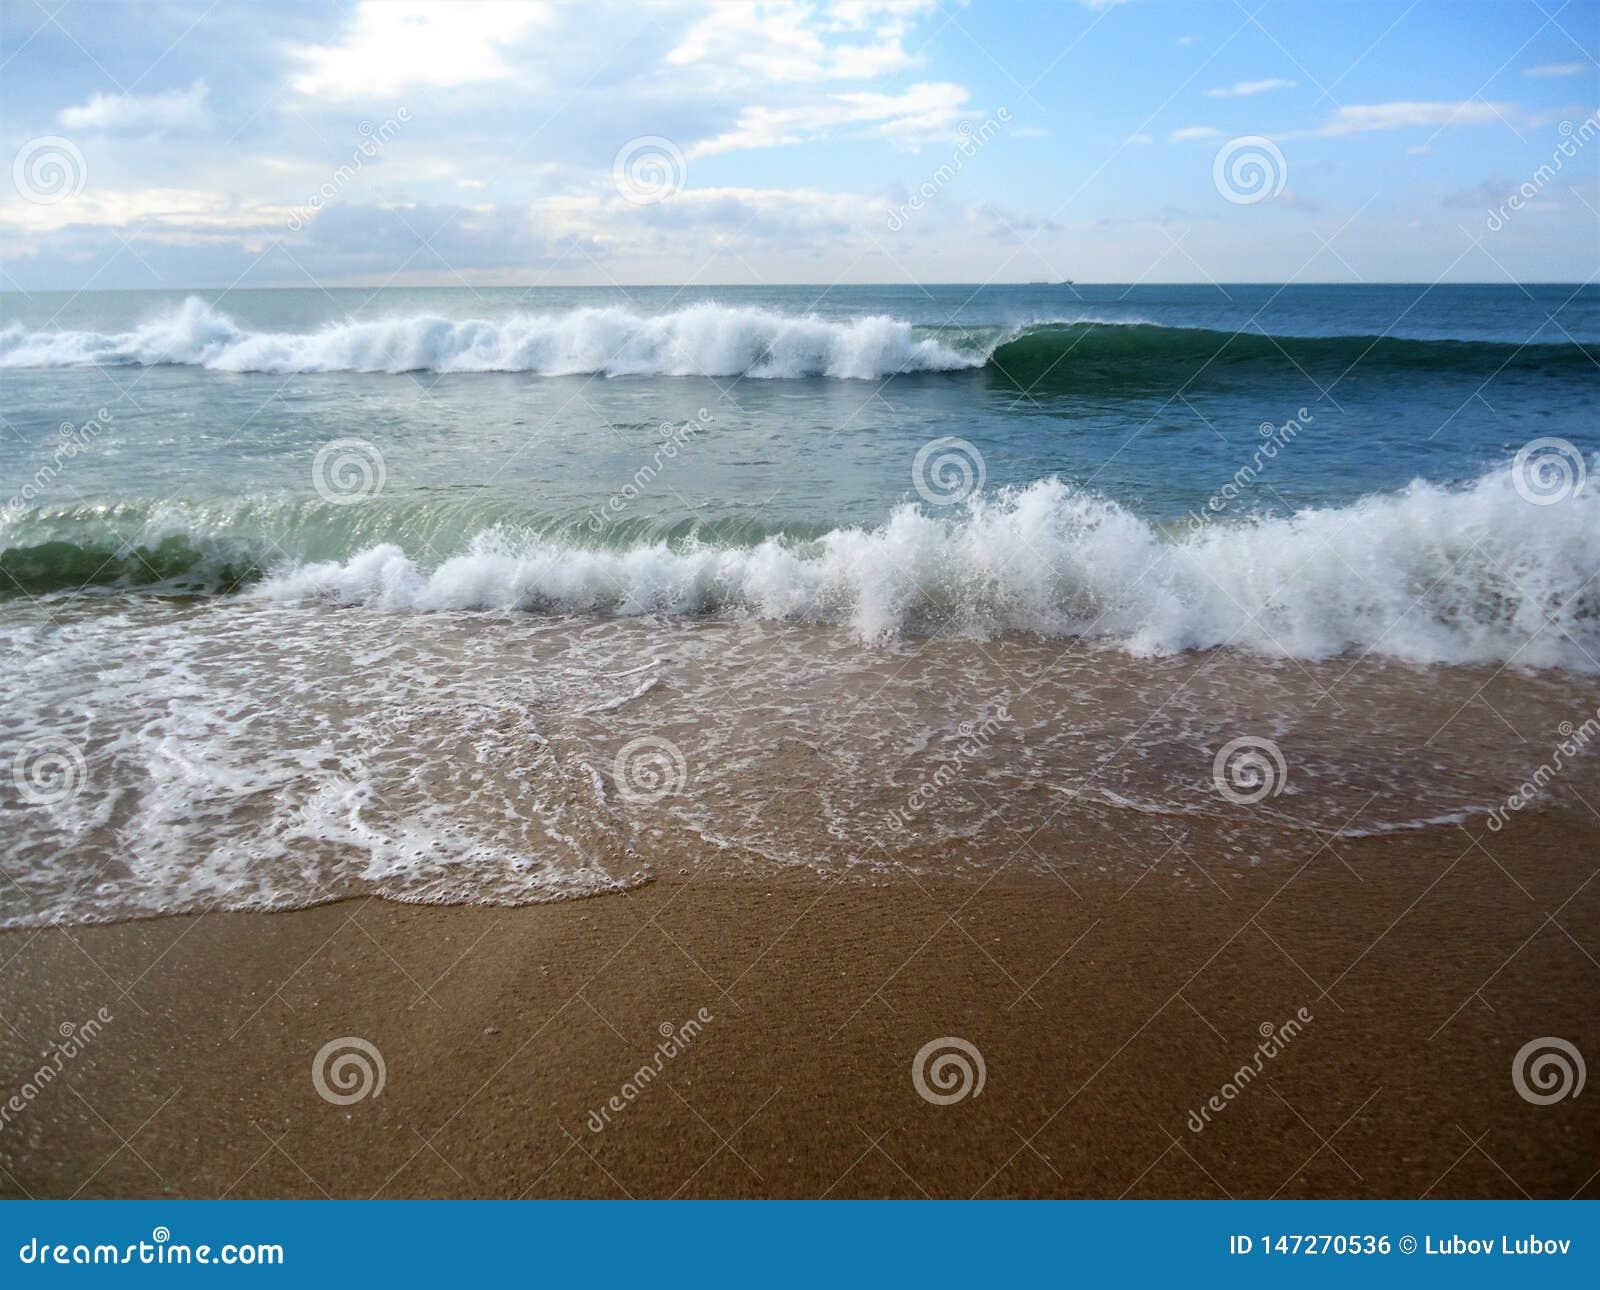 Big white waves and blue beautiful sea.